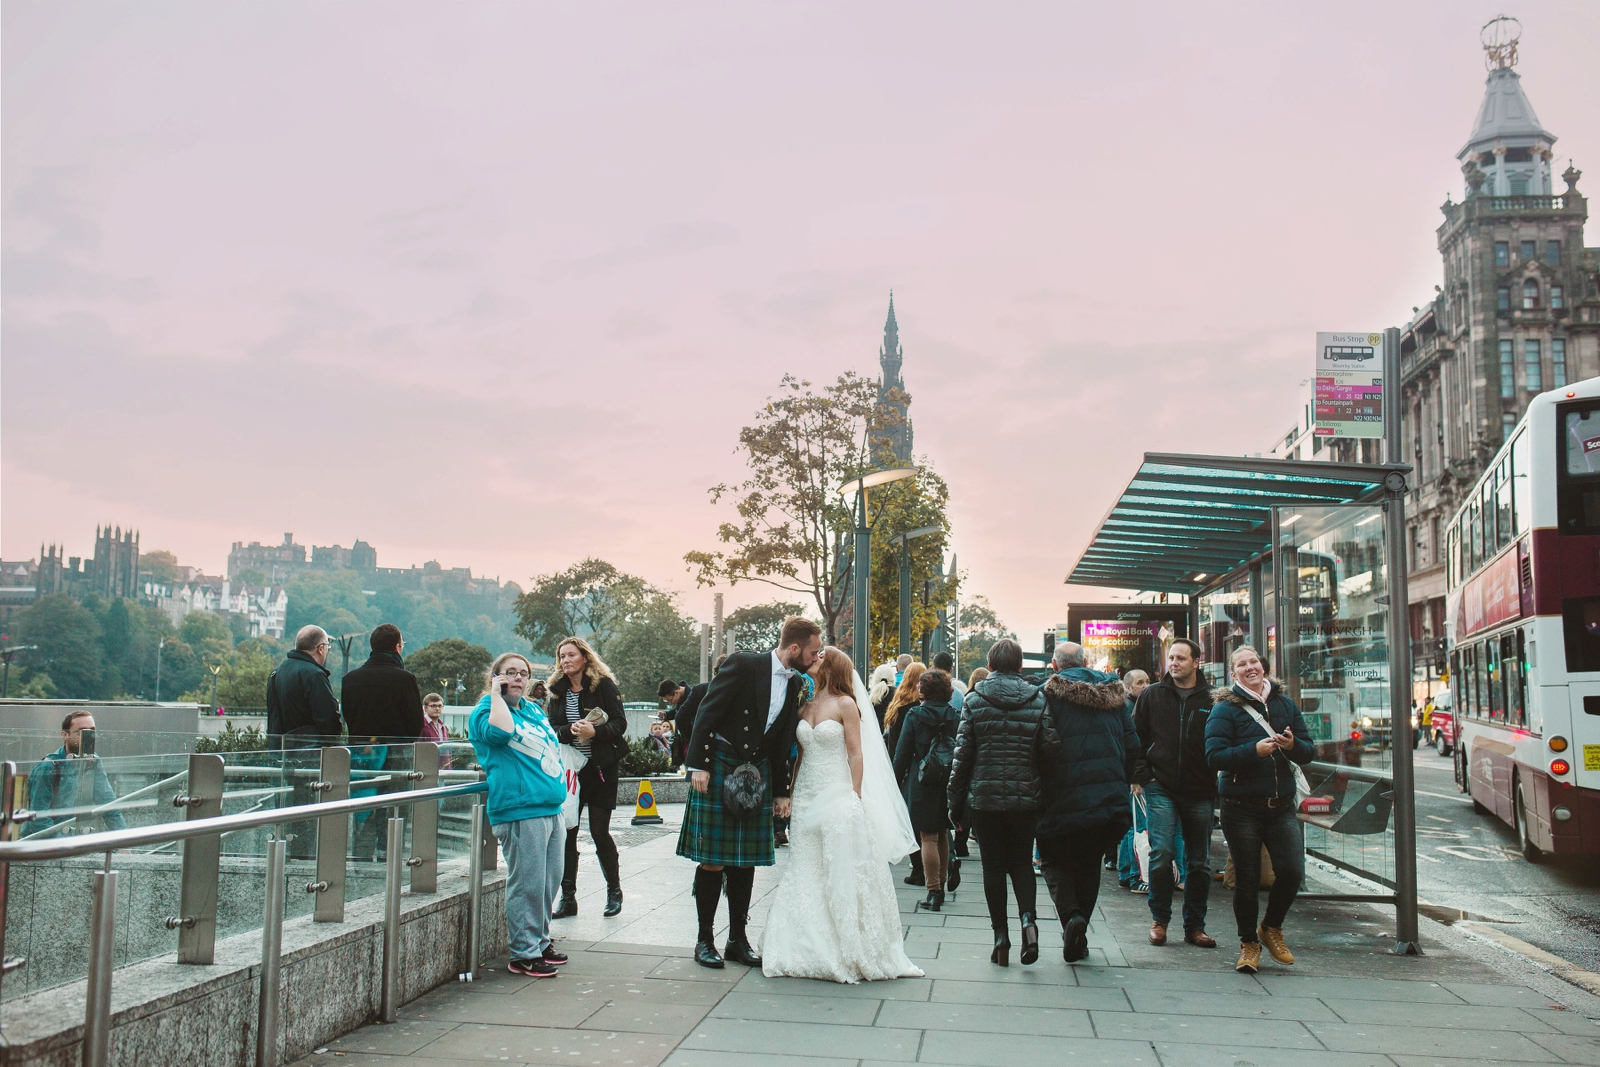 weddingbalmoralhoteledinburgh53-15.jpg